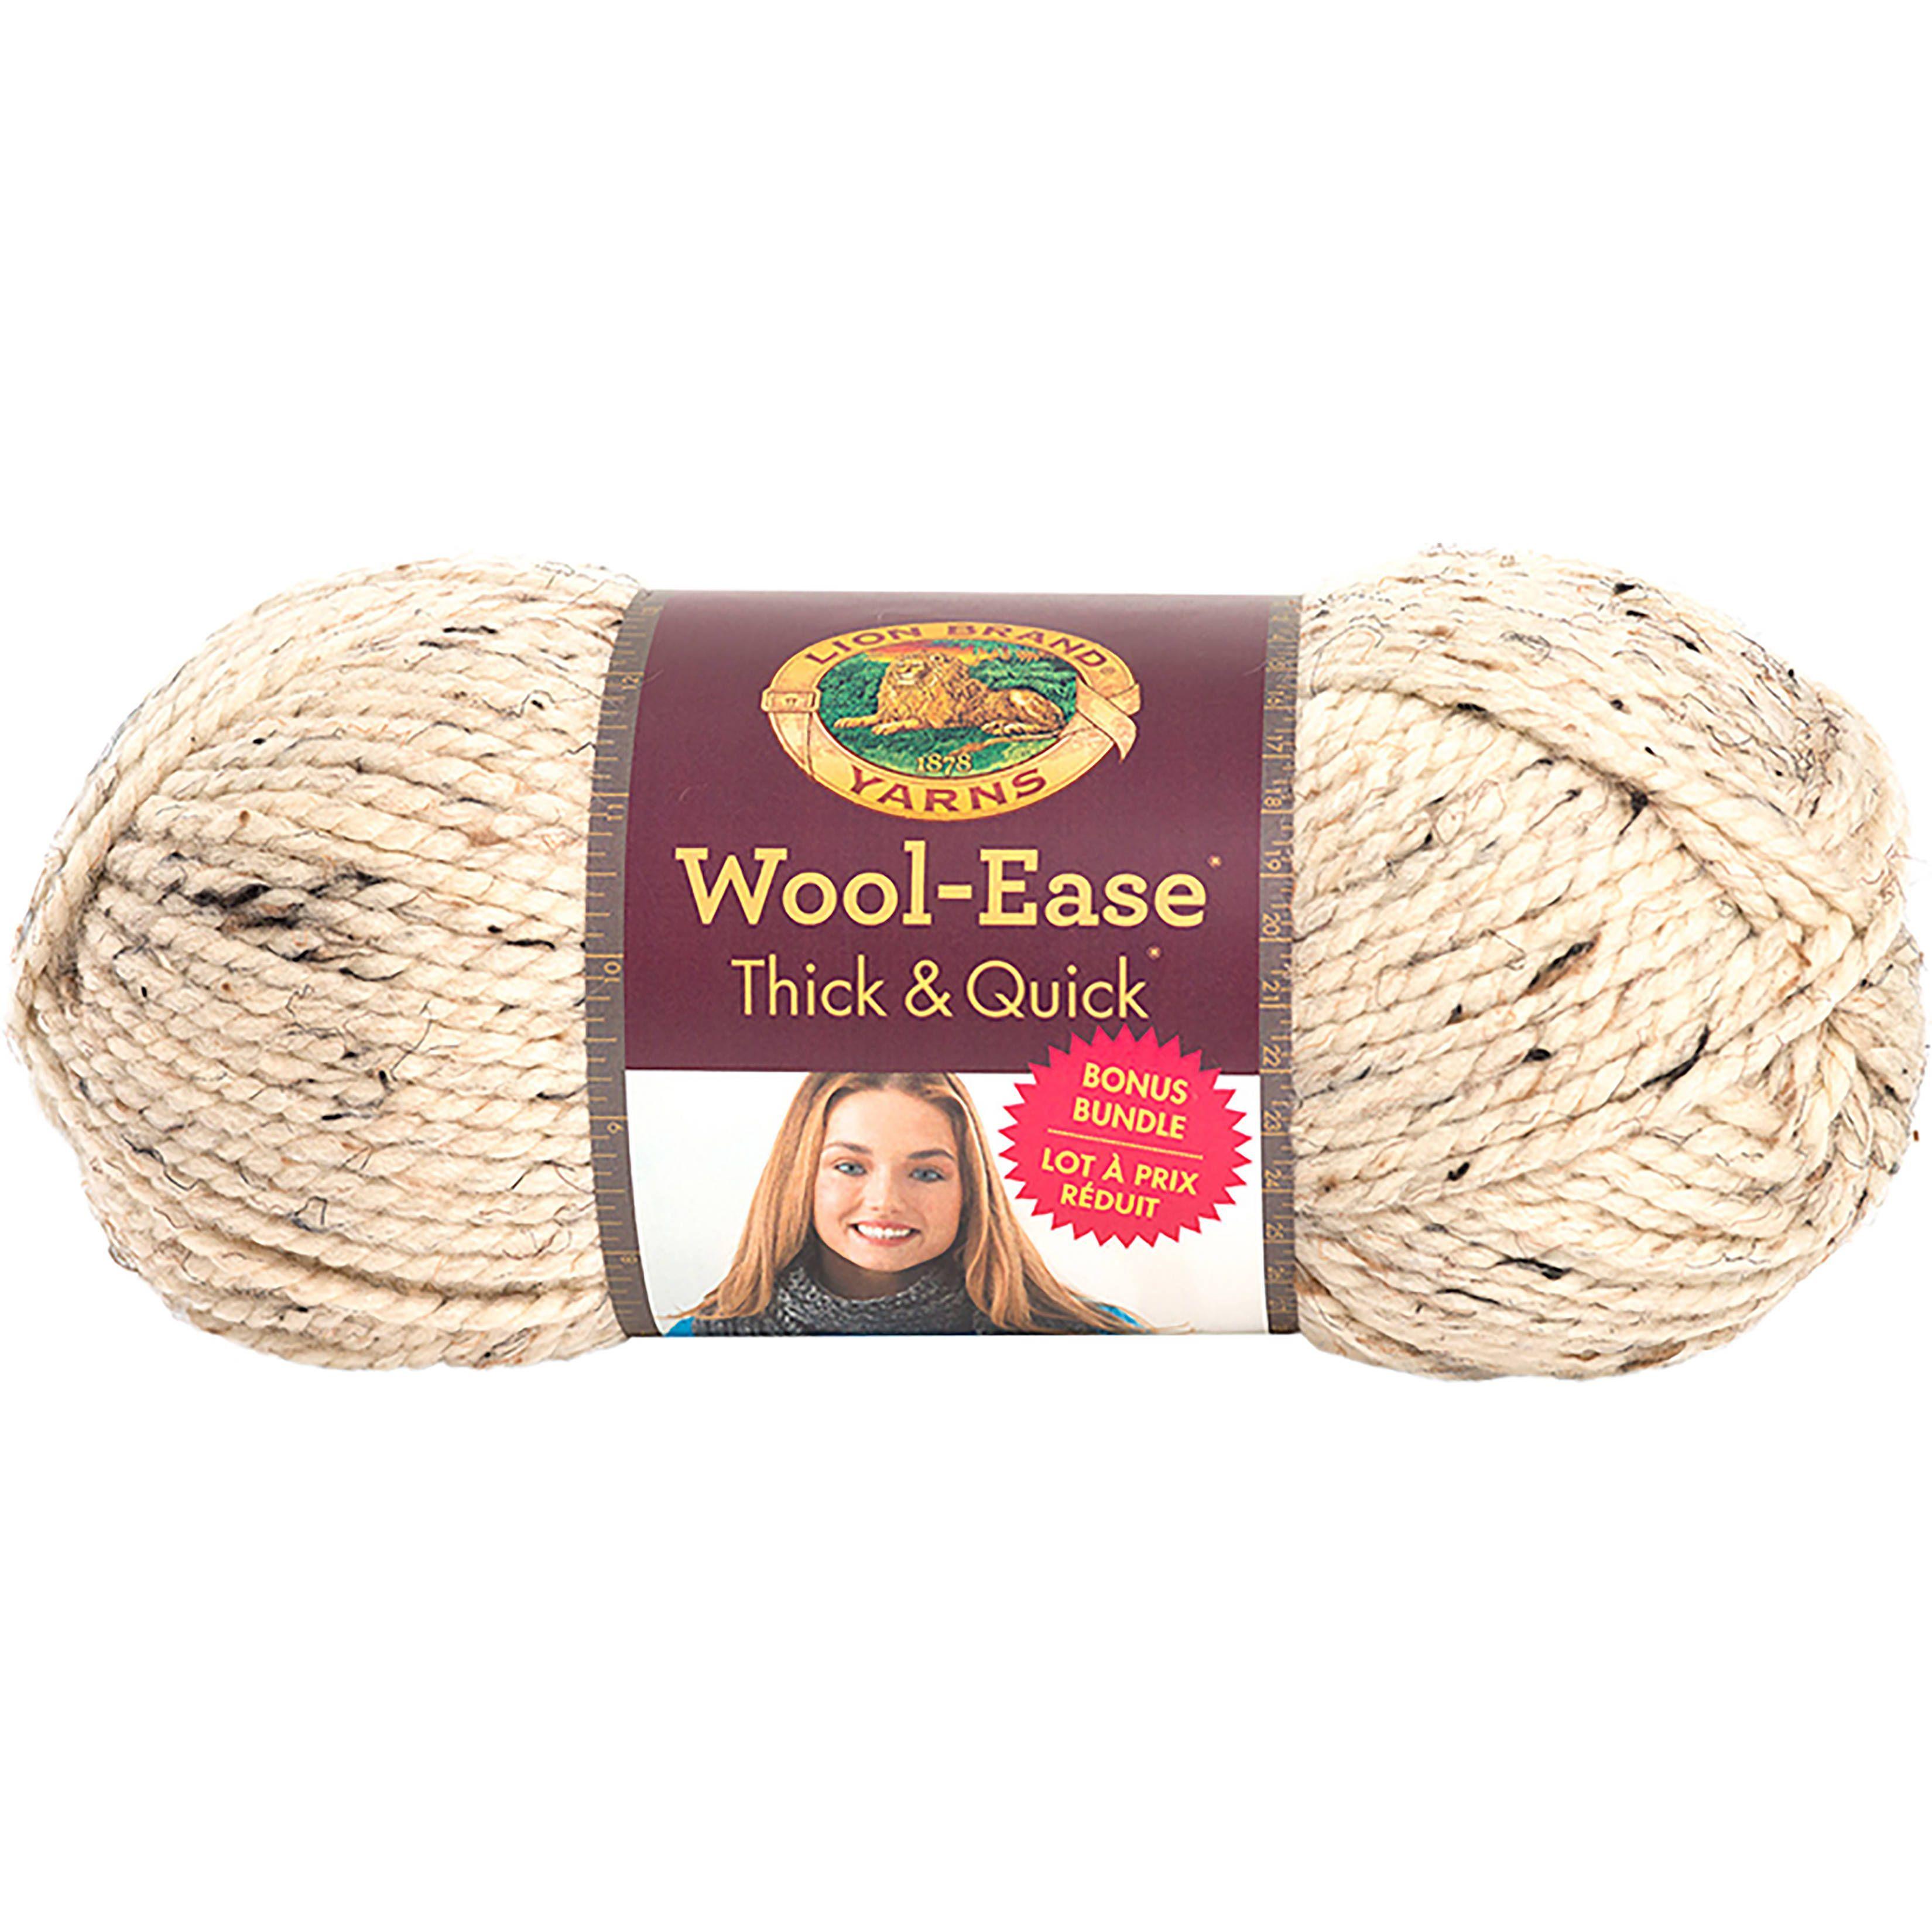 Lion Brand Wool-Ease Thick & Quick Bonus Bundle Yarn-Oatmeal | My ...